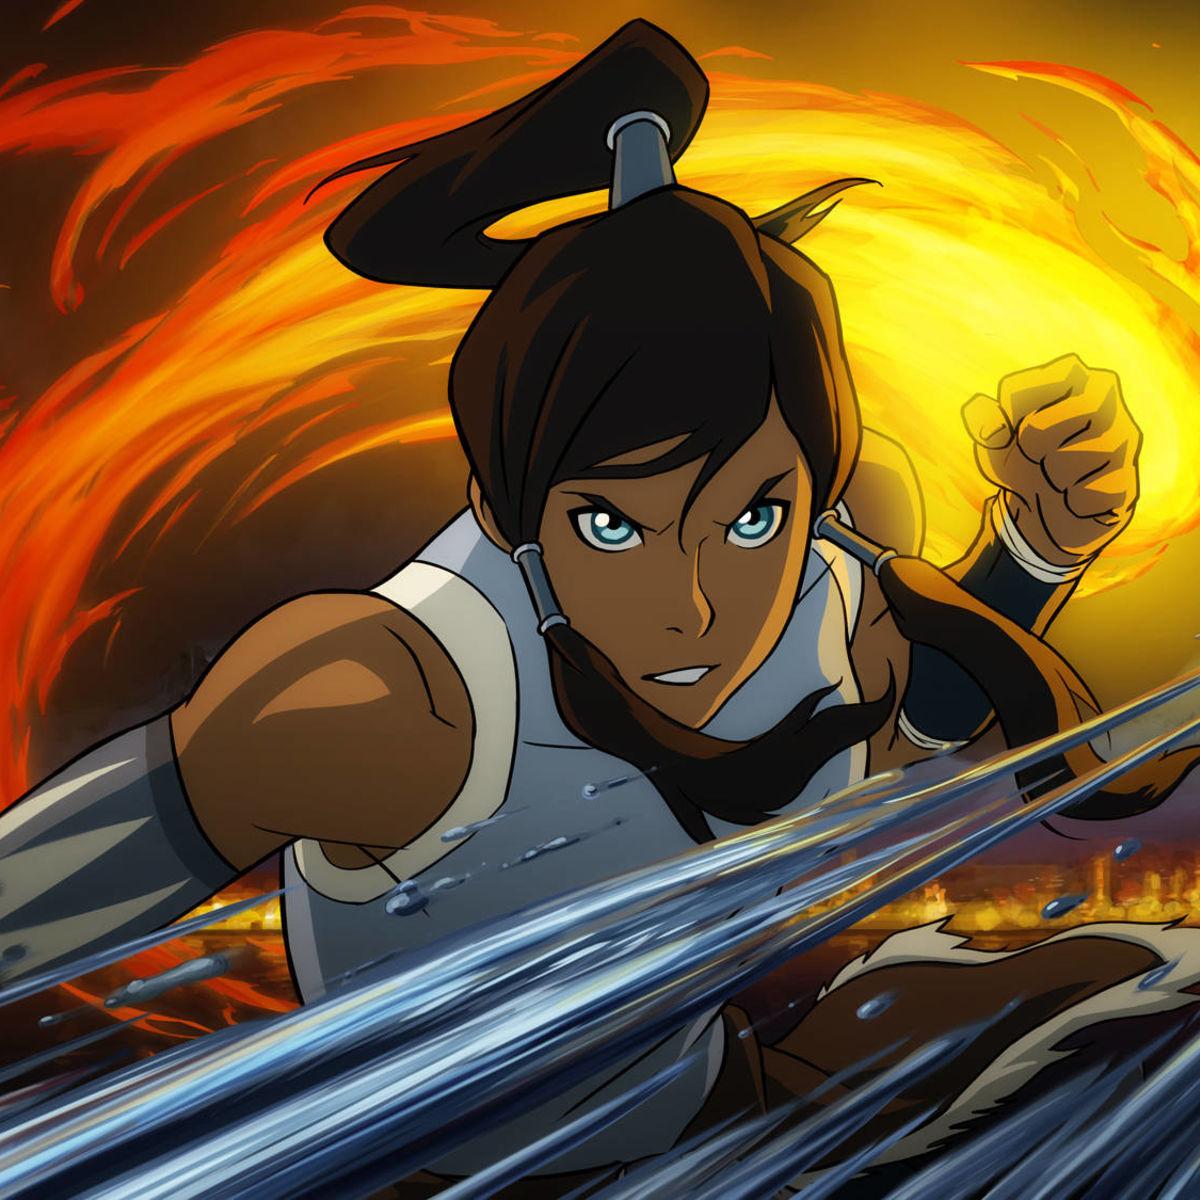 Avatar The Last Airbender Legend Of Korra And Their Assortment Badass Women